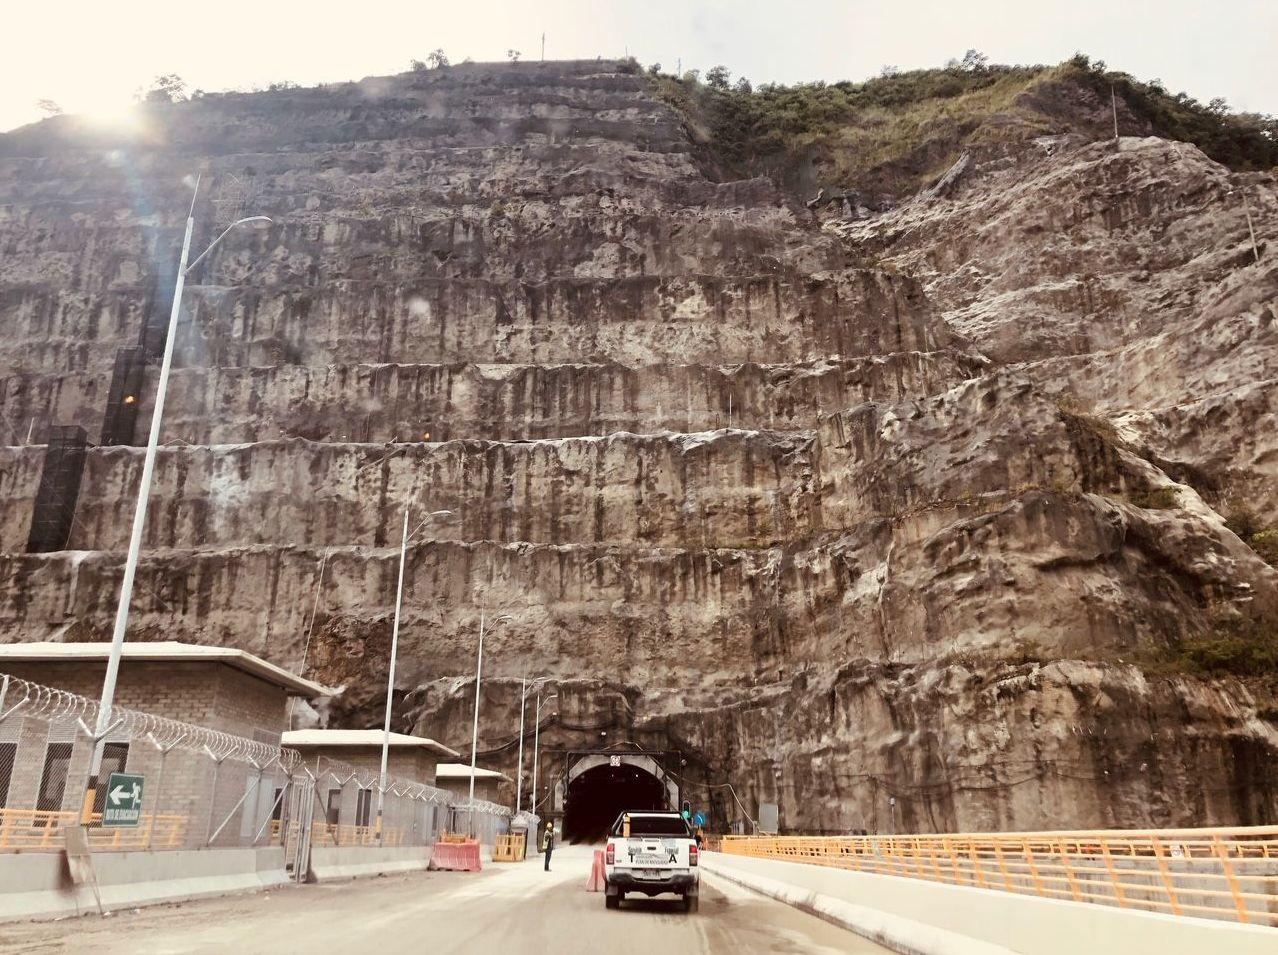 La ruta hacia las obras de Hidroituango